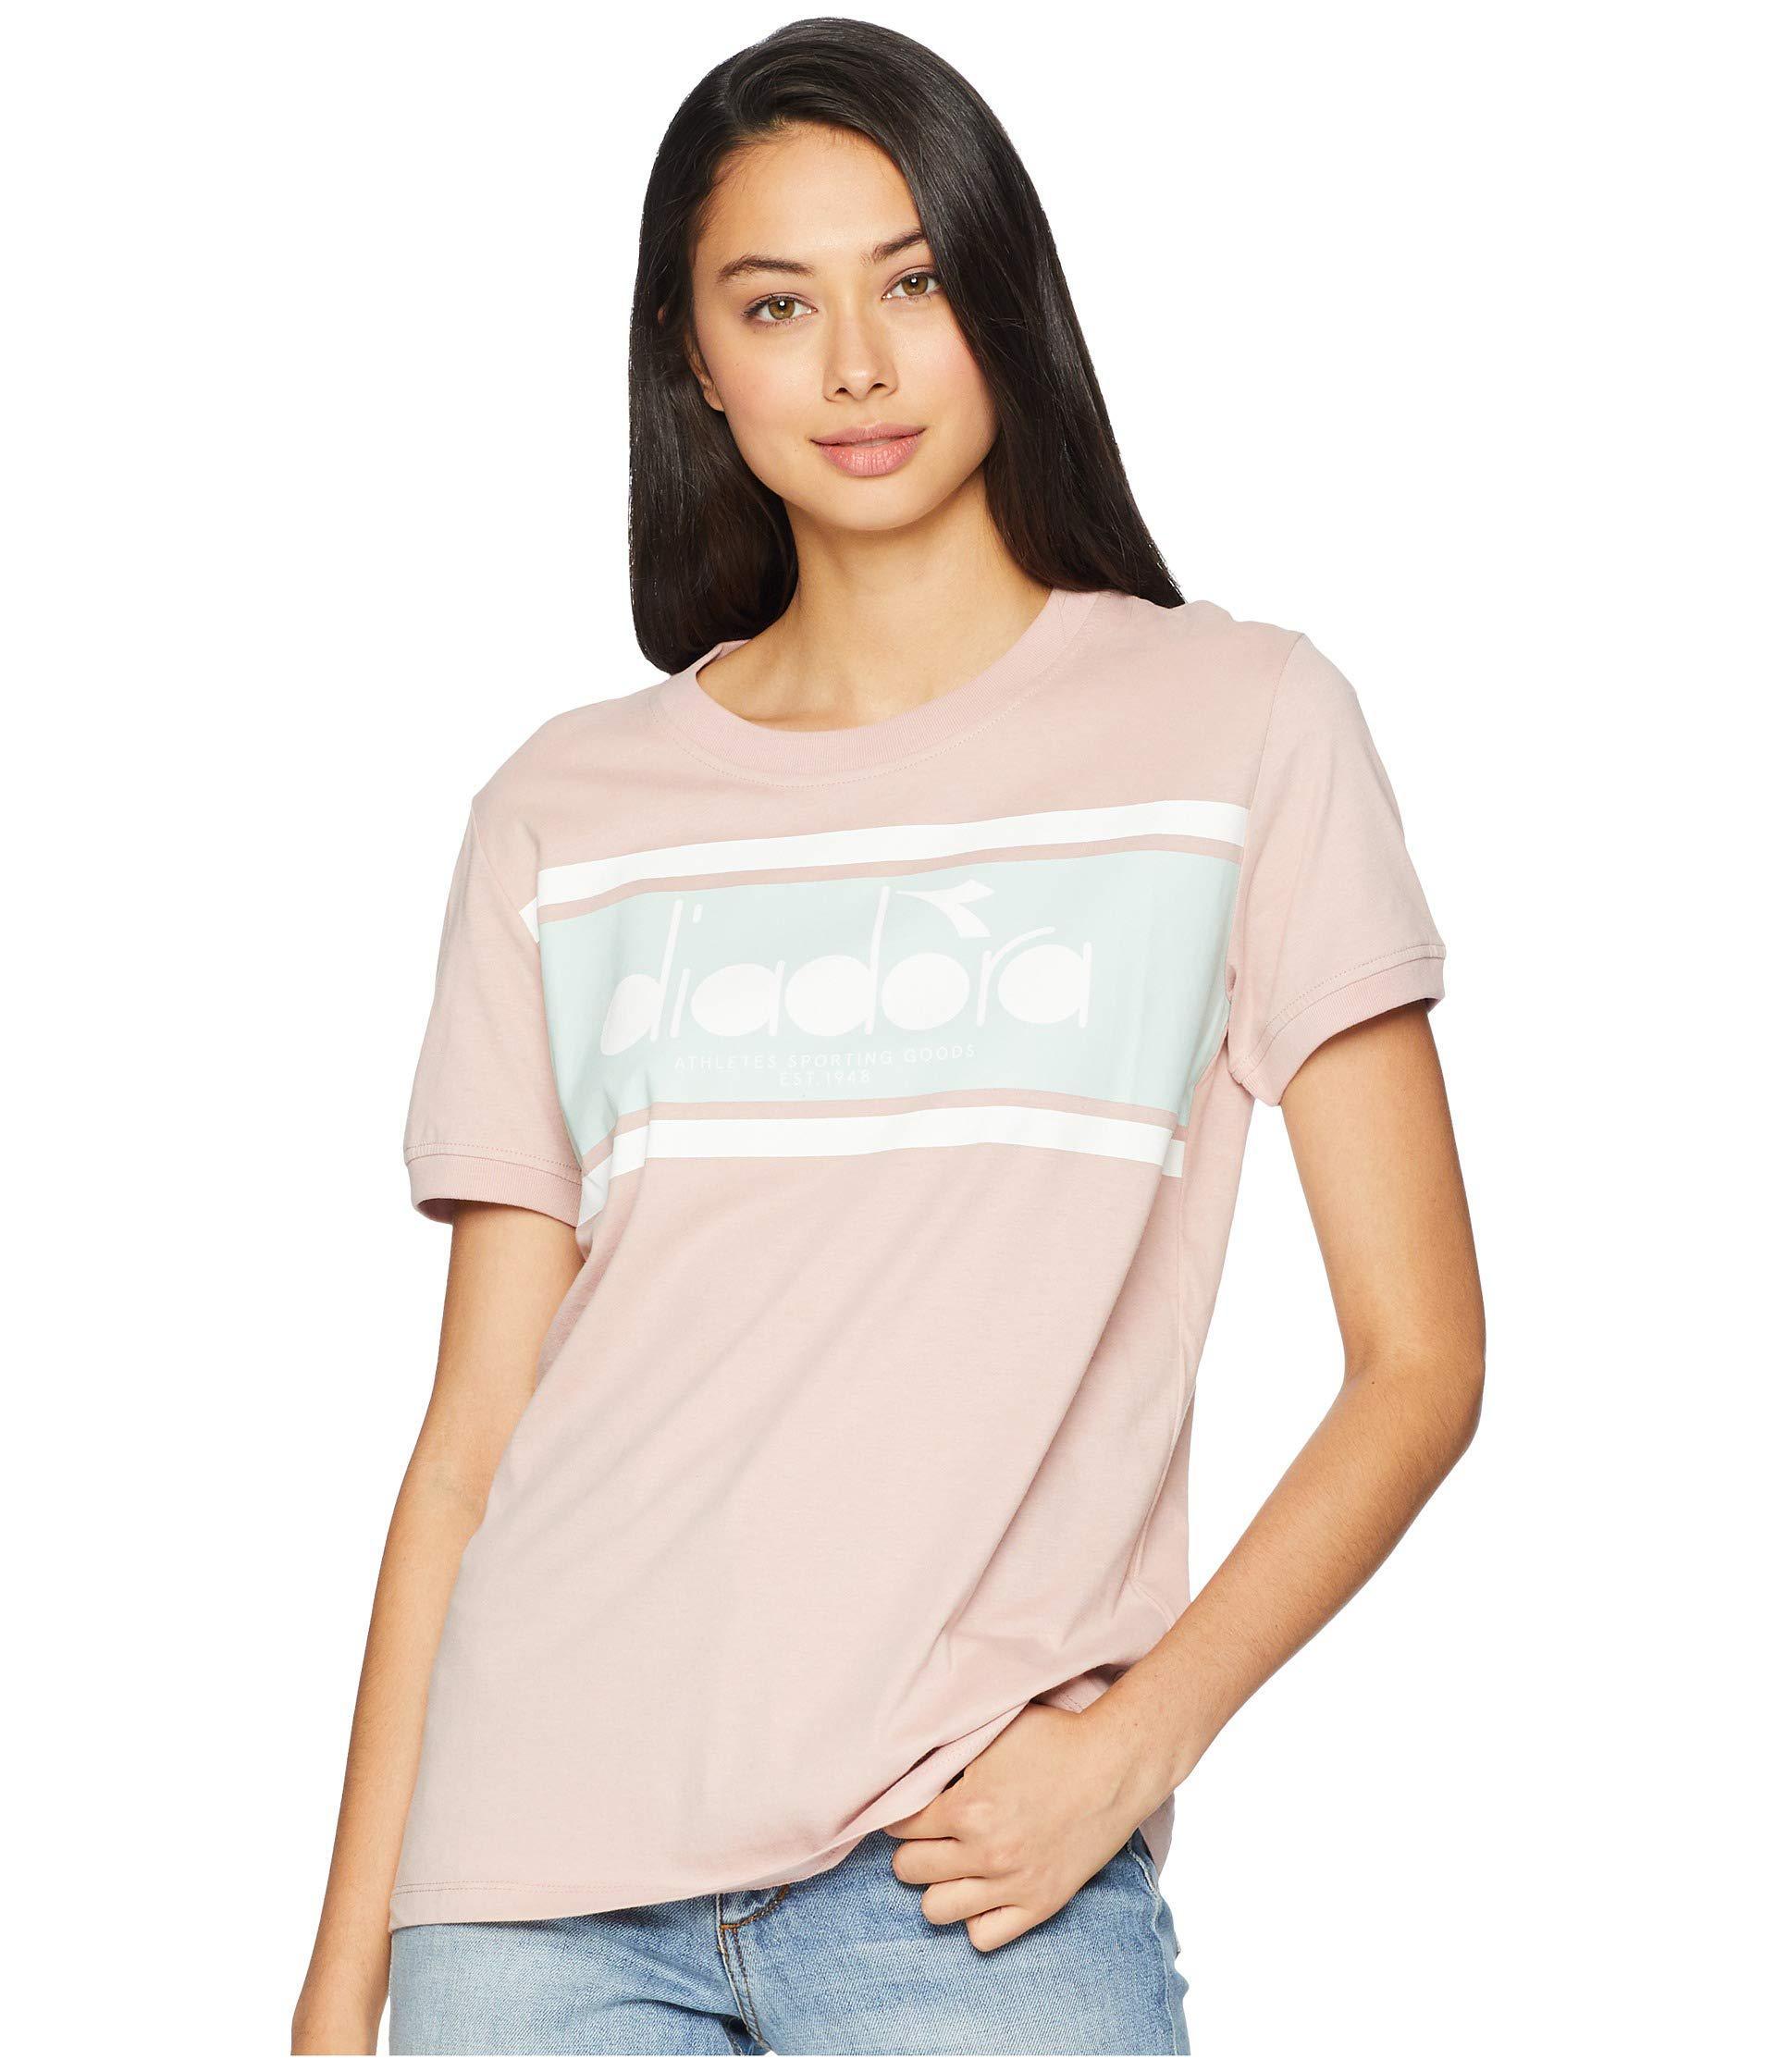 f08f0dce Lyst - Diadora Short Sleeve Spectra T-shirt (black/white) Women's T ...